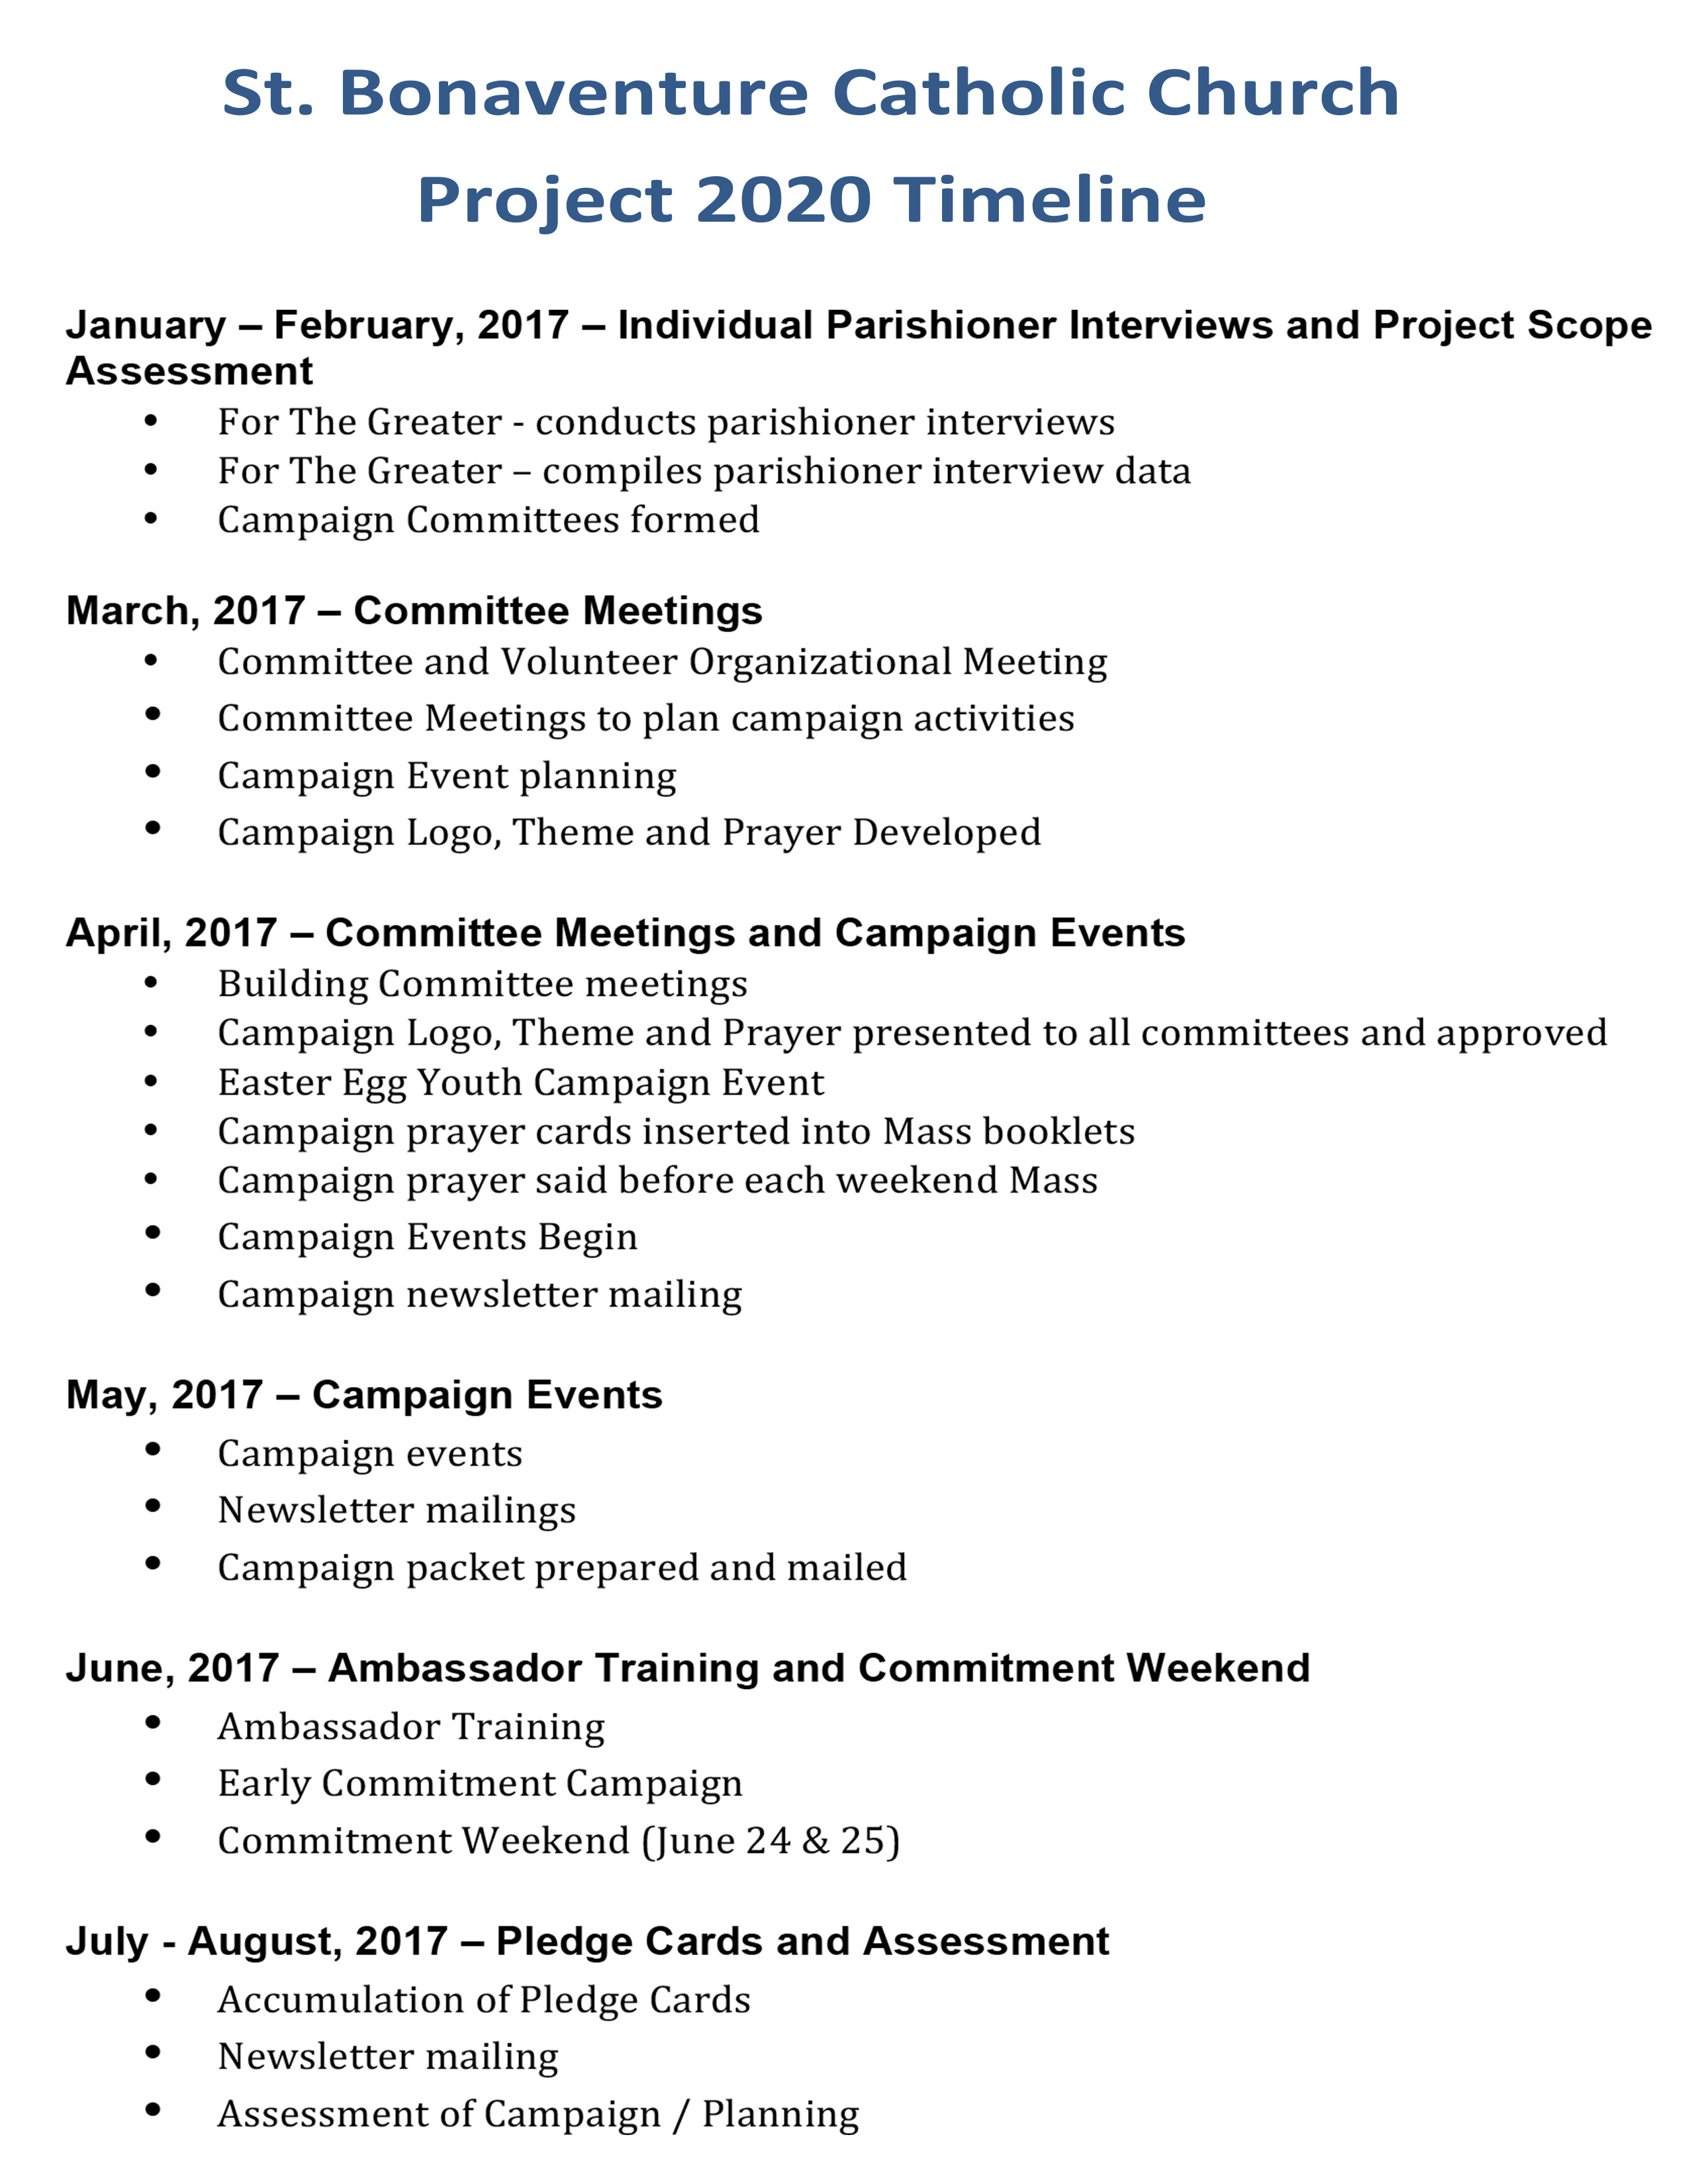 Microsoft Word - Project 2020 Timeline.docx - Saint for 2020 Catholic Liturgical Calendar Activities